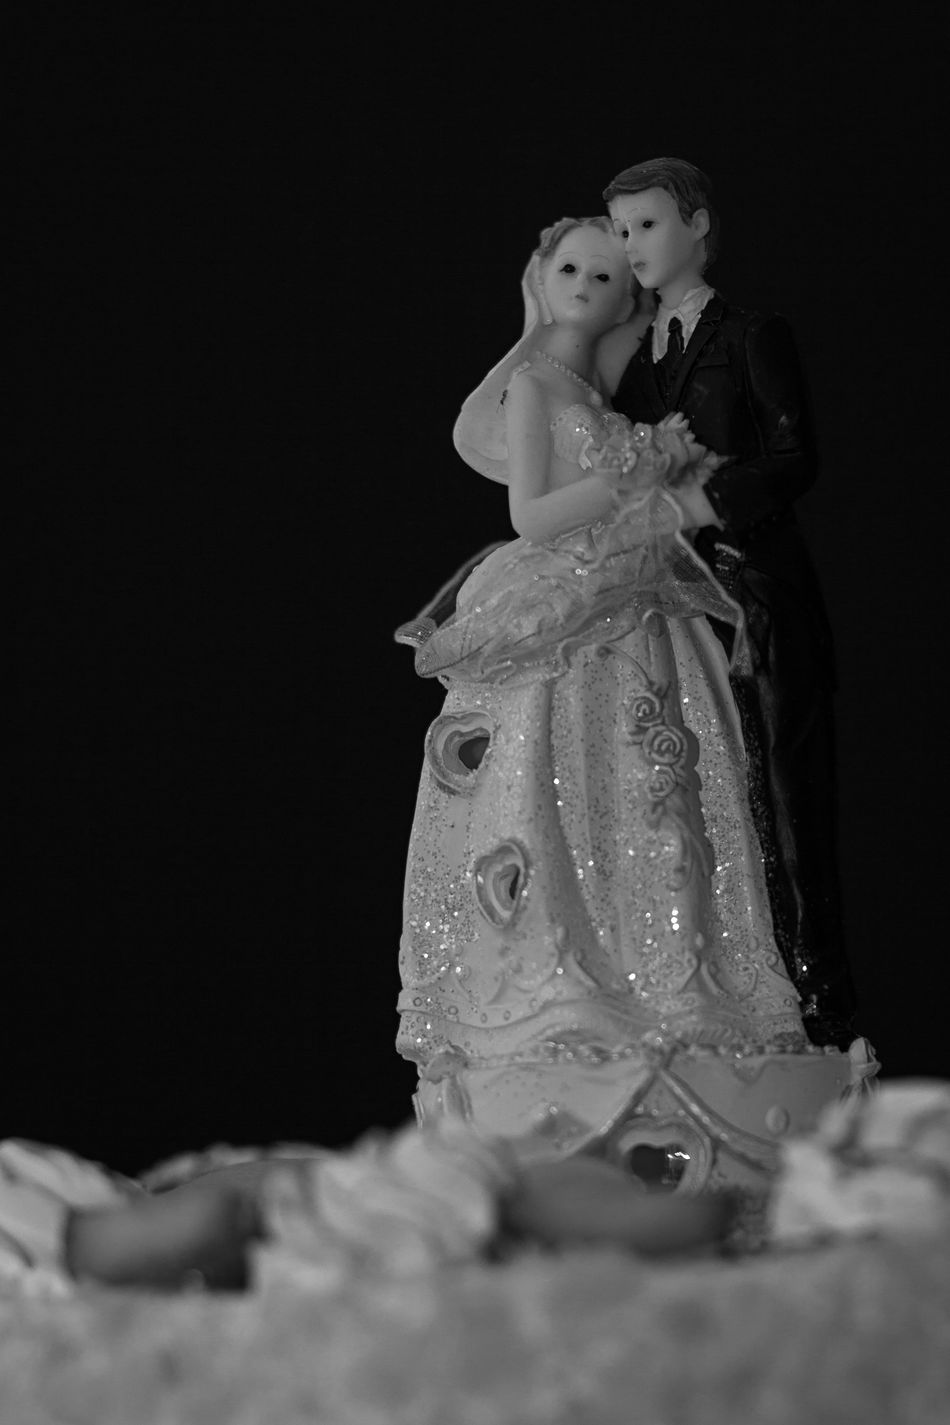 Black Background Bride Celebration Close-up Full Length Groom Indoors  Life Events Night People Studio Shot Togetherness Wedding Wedding Dress